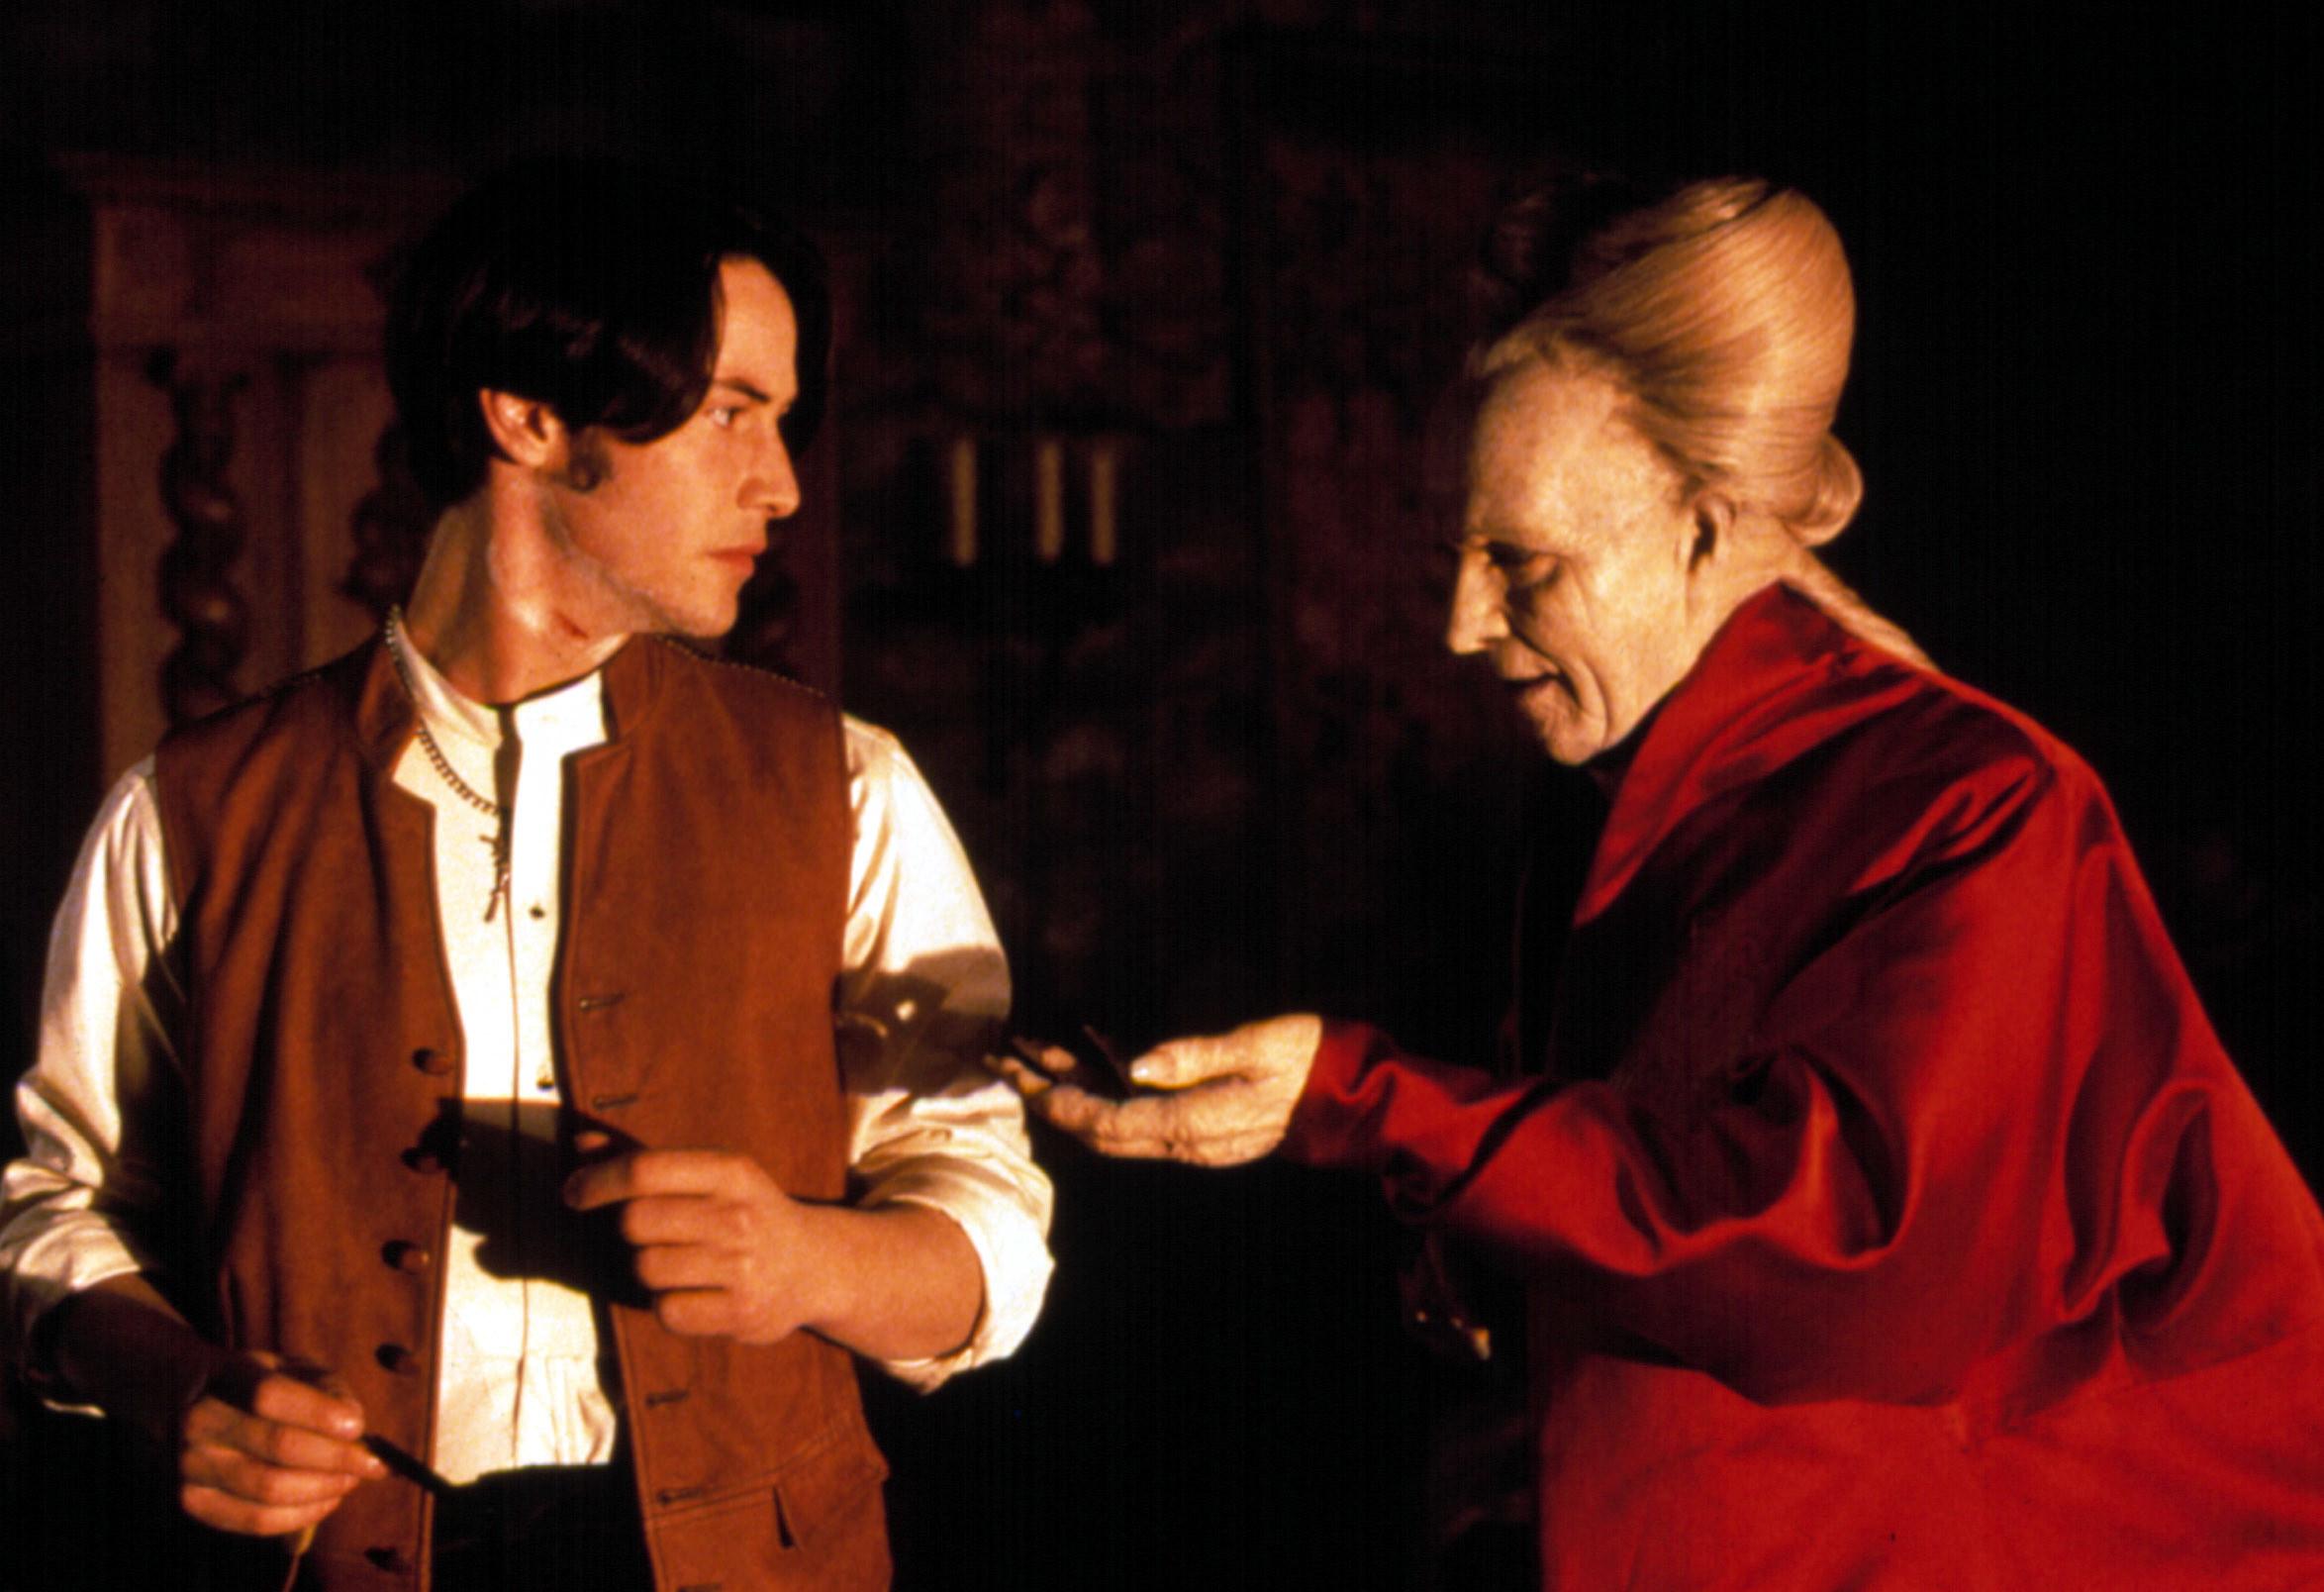 Keanu Reeves being offered something by Gary Oldman